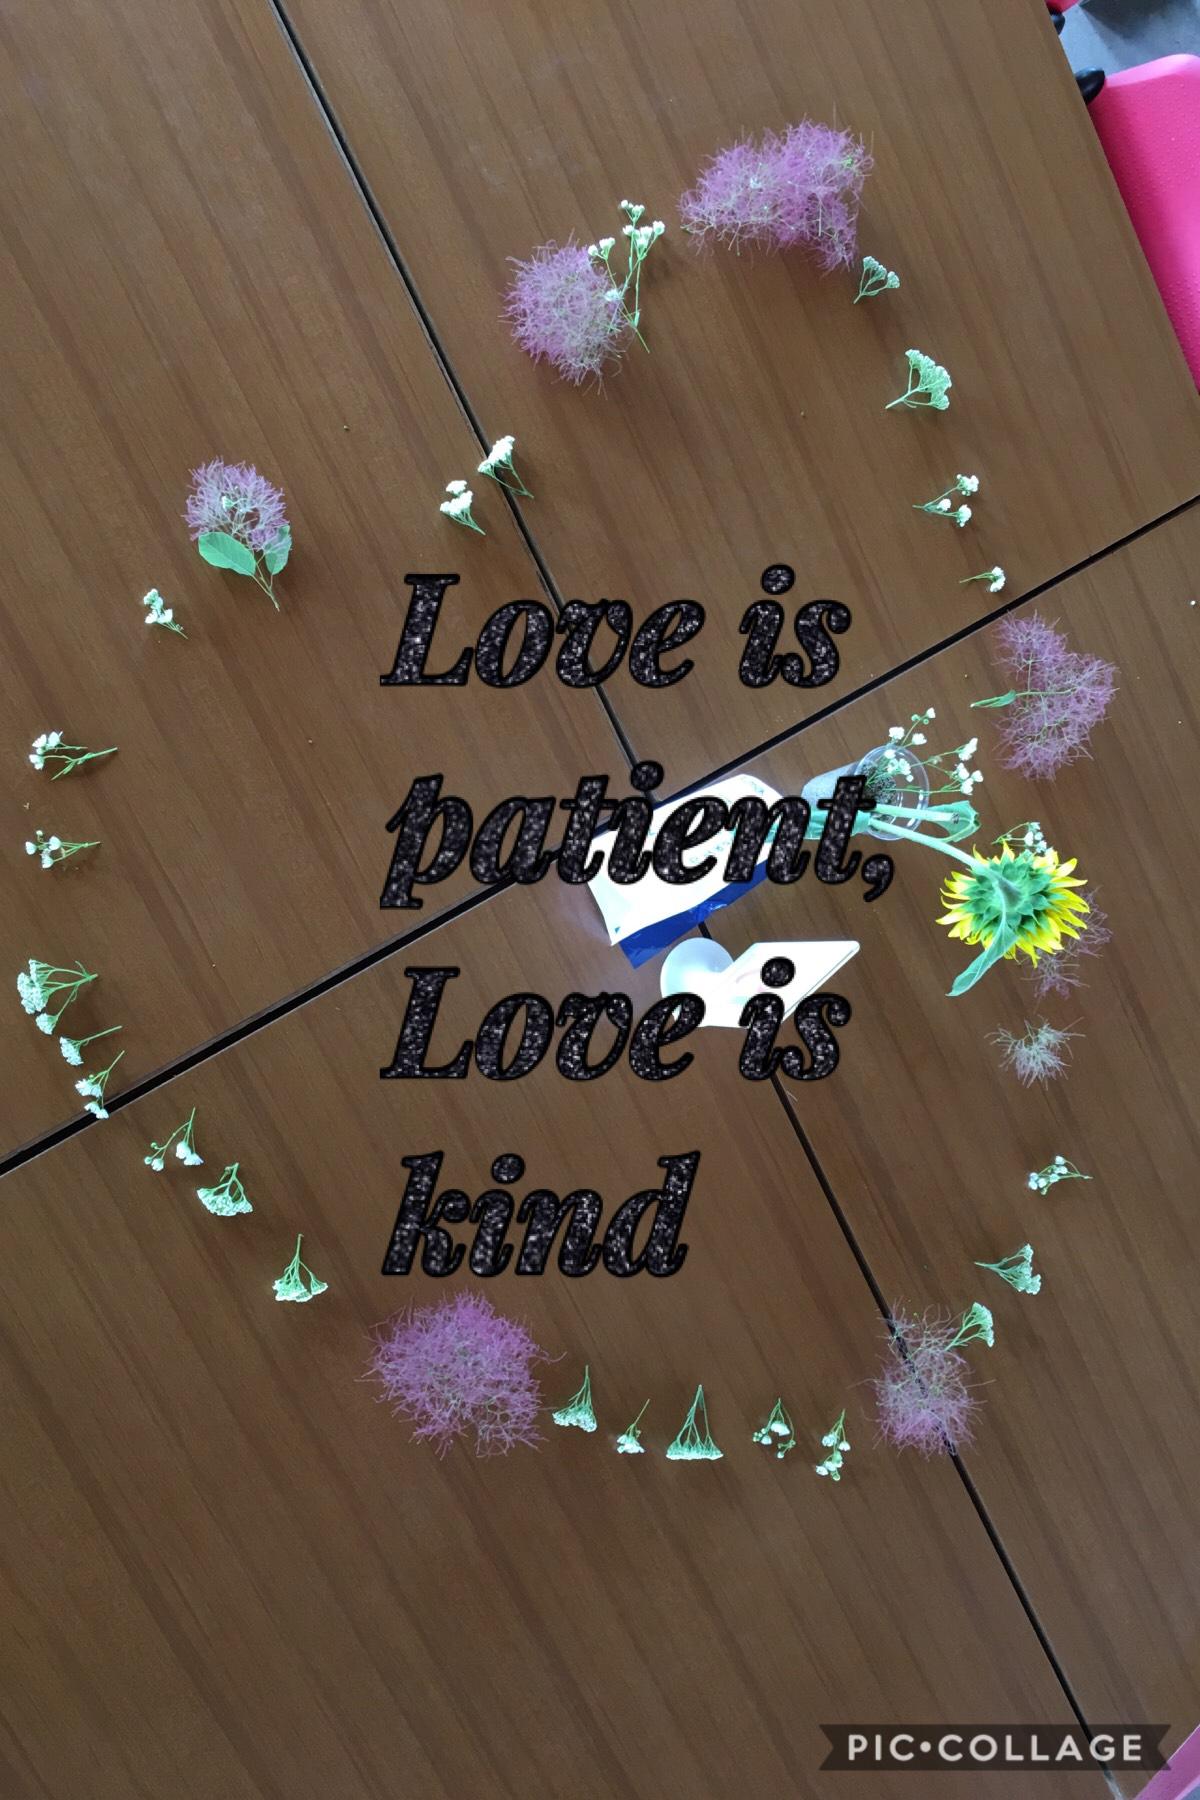 Love is patient, Love is kind. My favorite bible verse!!!